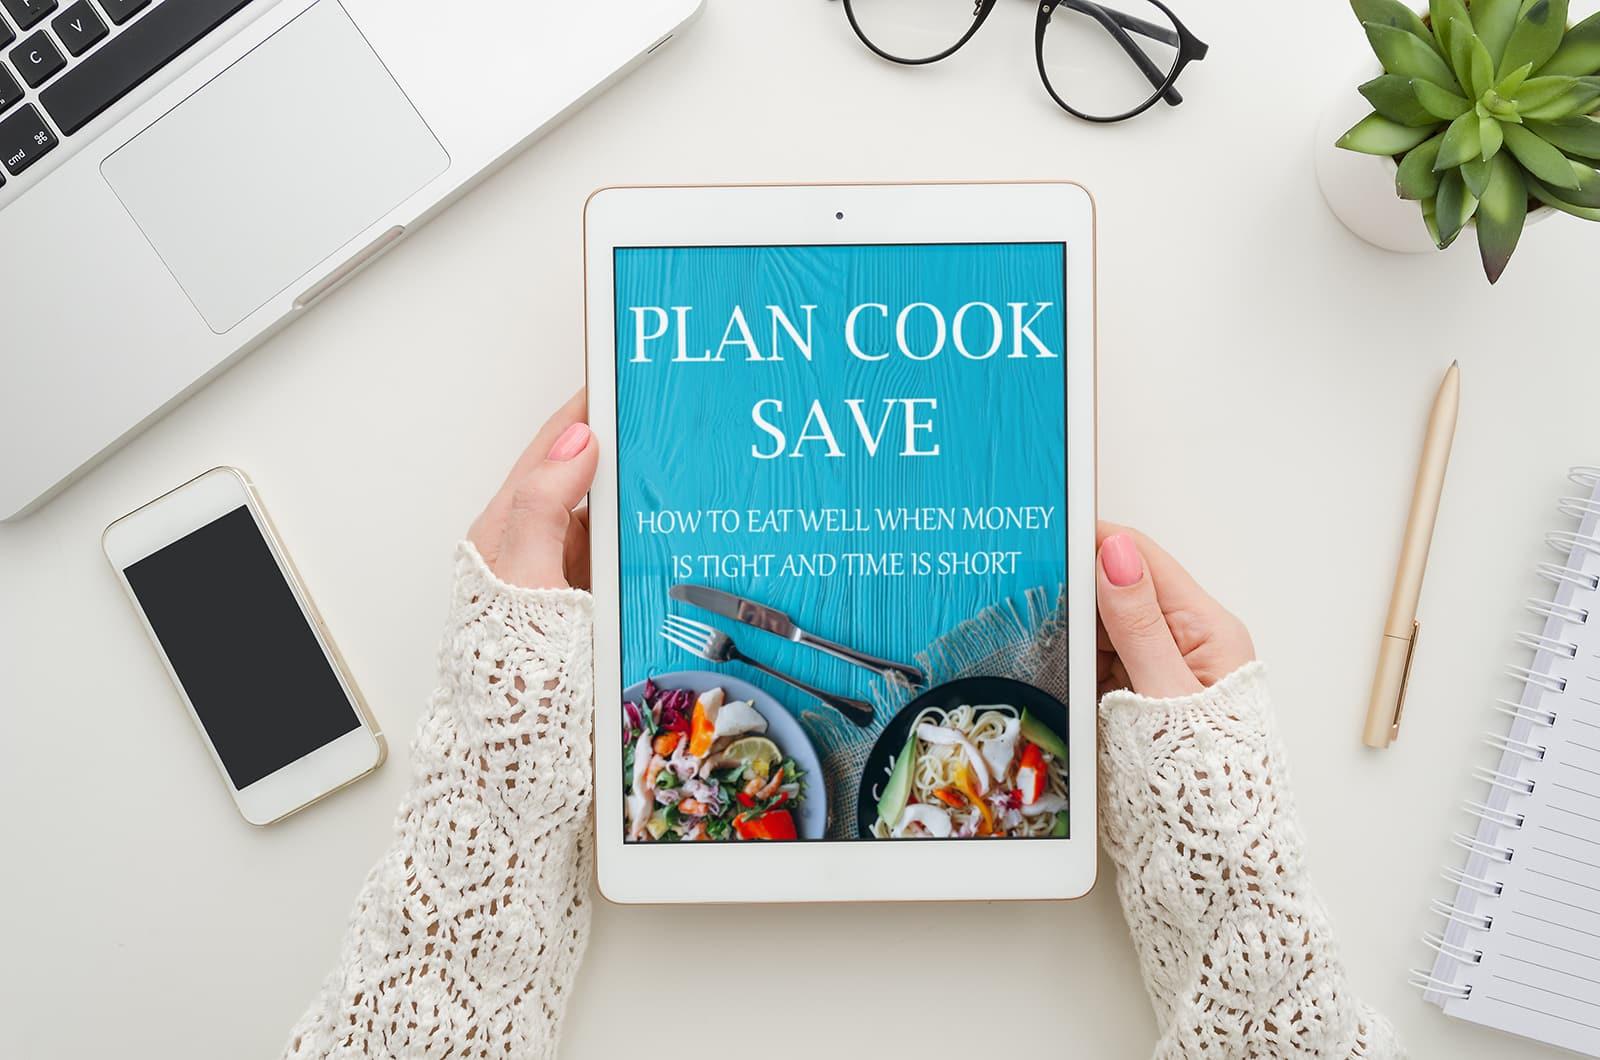 plan cook save ebook on ipad